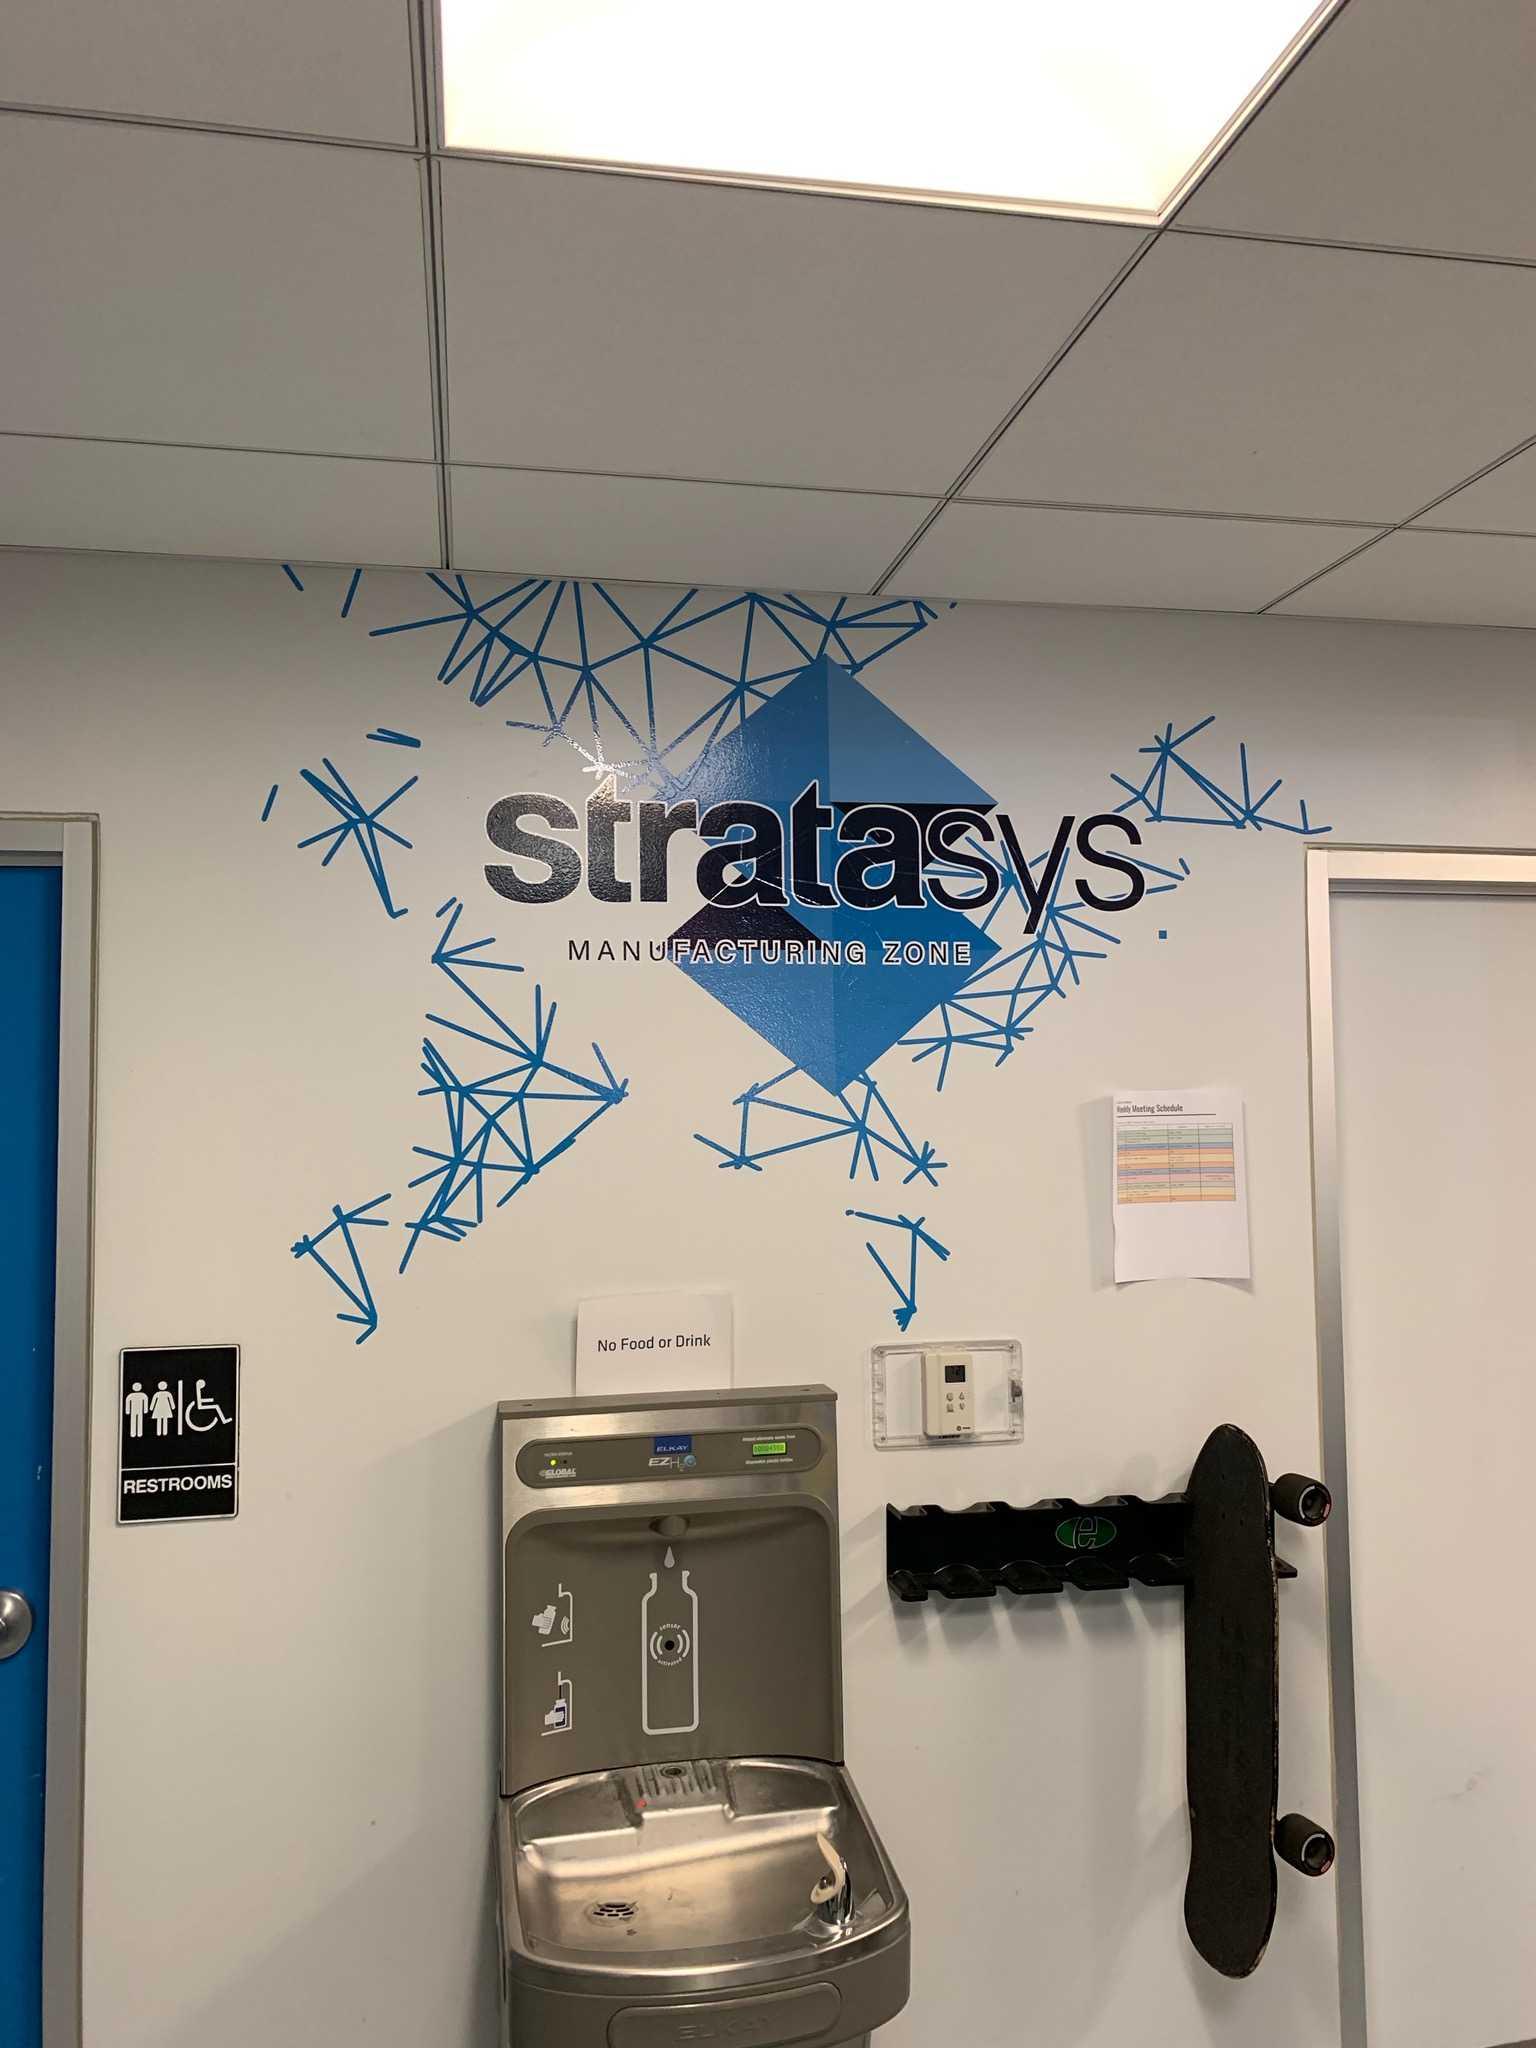 Stratasys Wall Vinyl